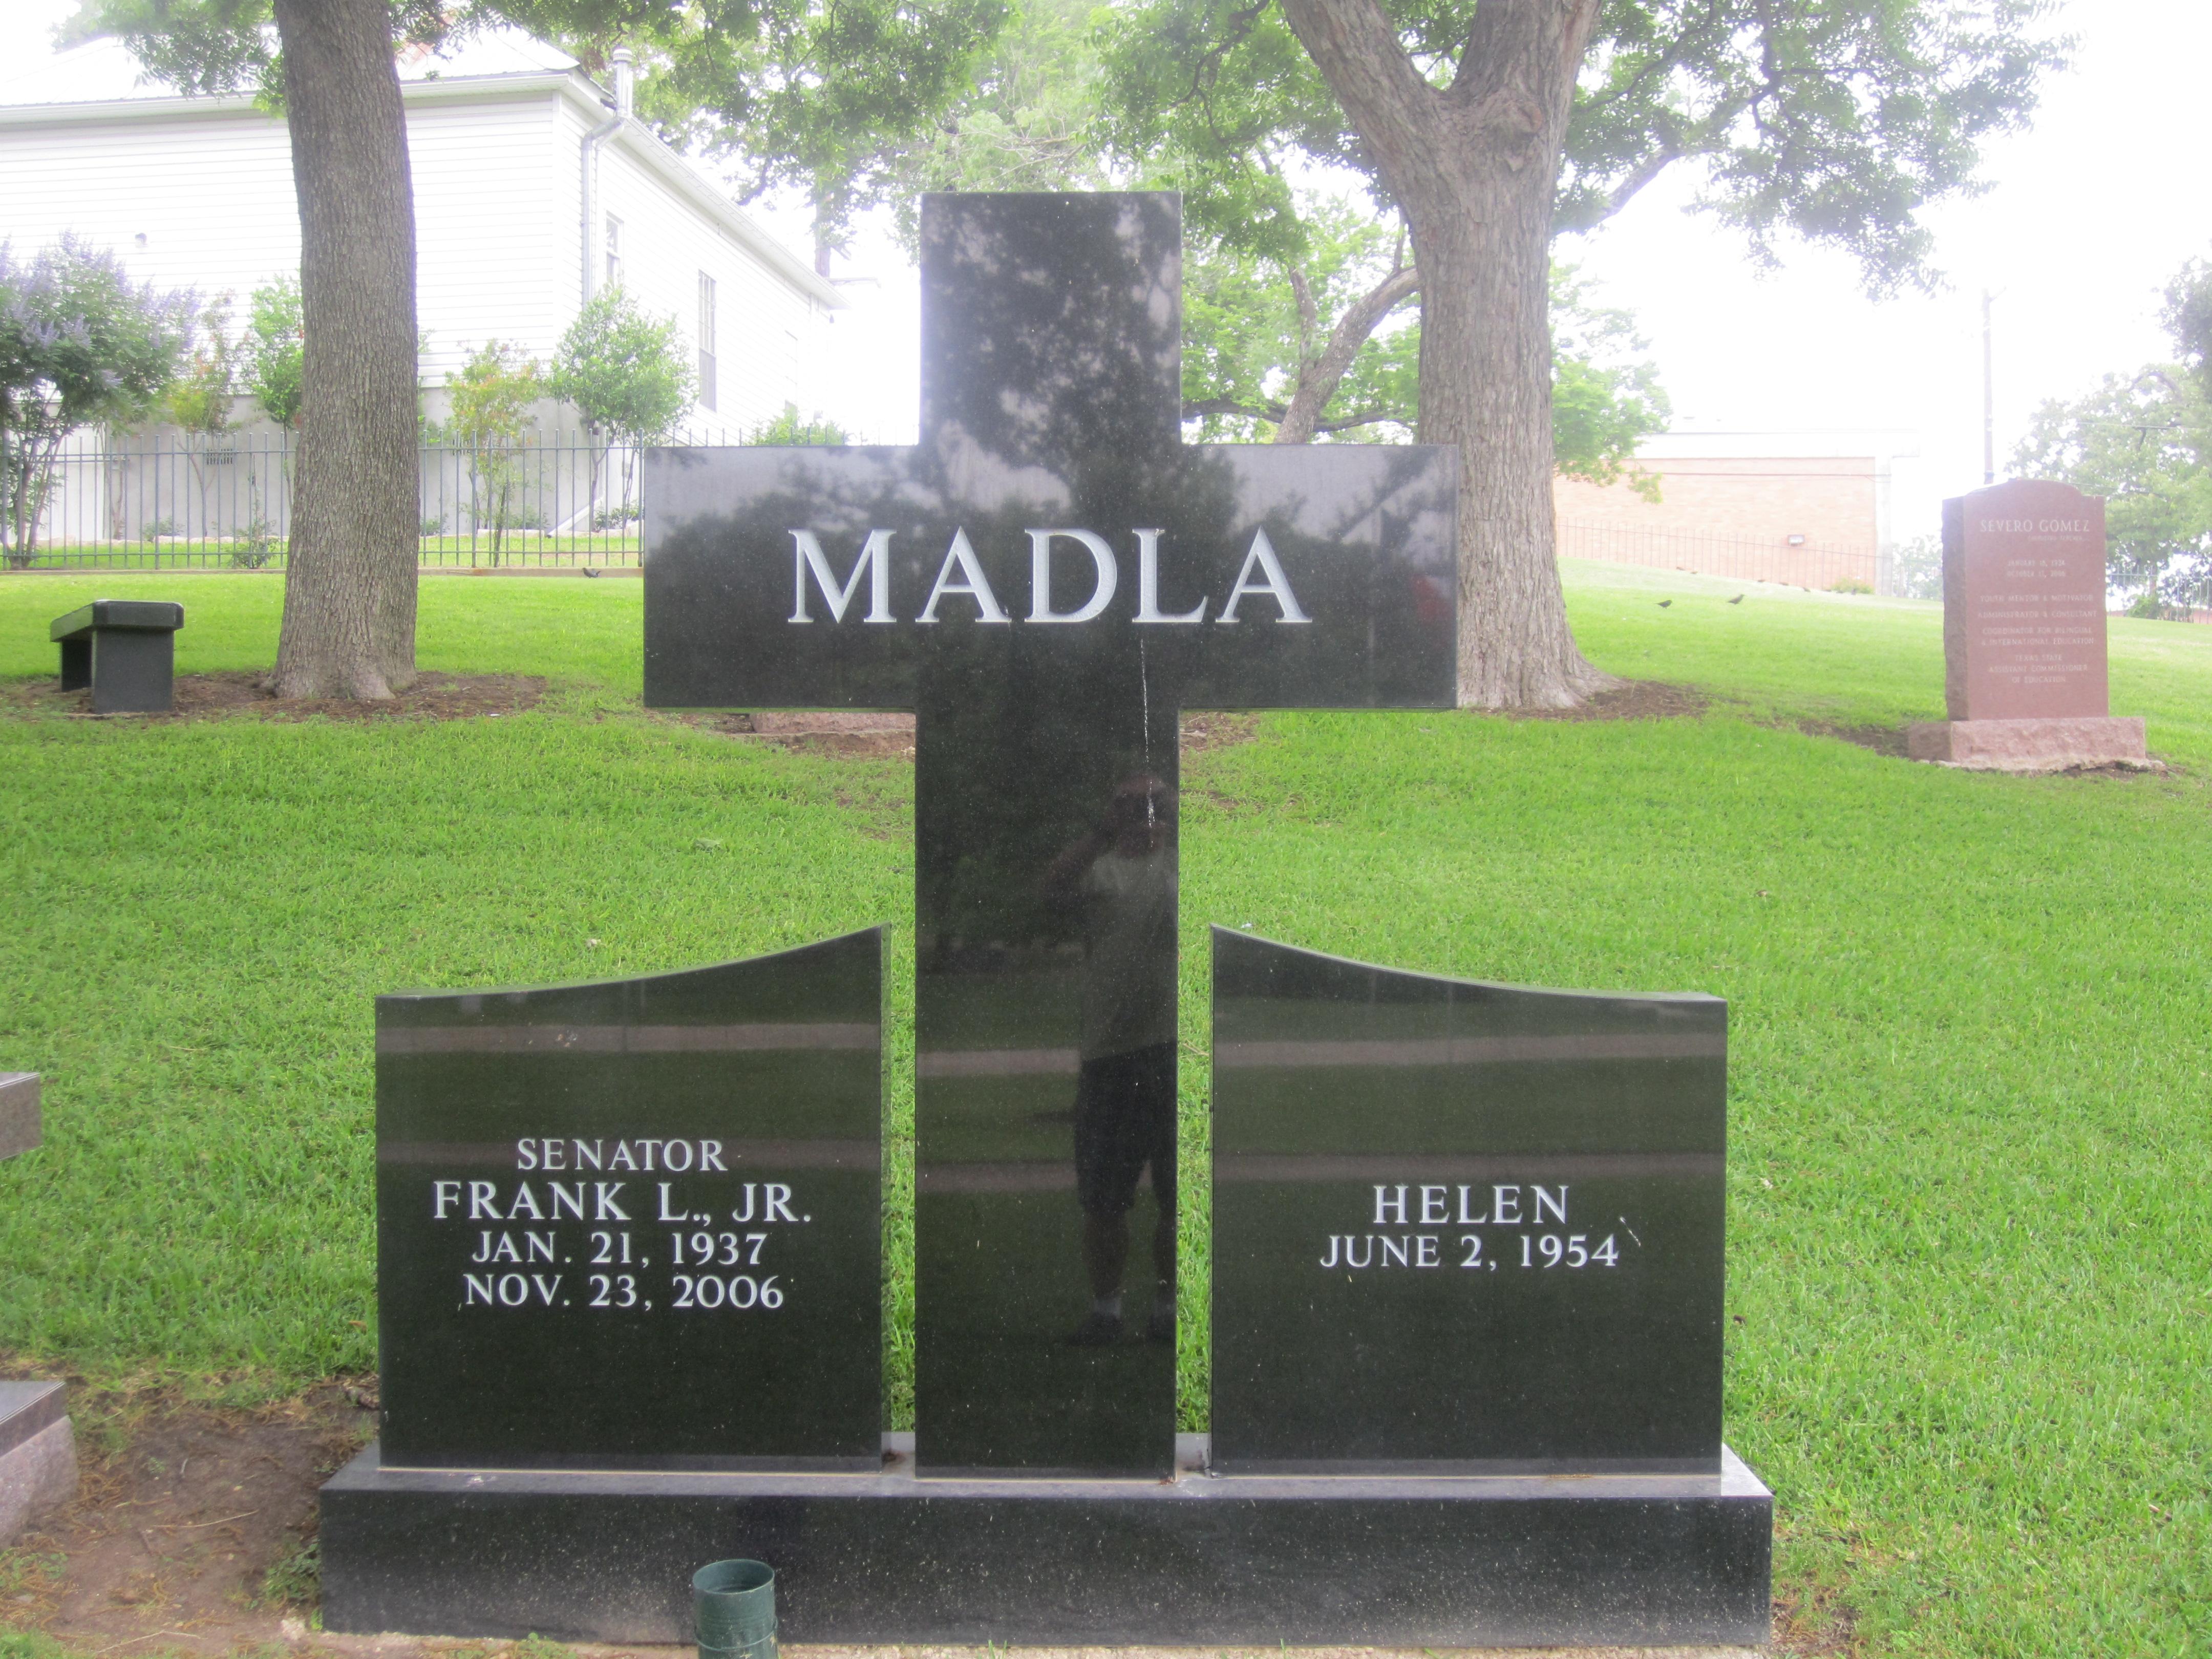 File:Frank Madla grave marker, Austin, TX IMG 2169.JPG